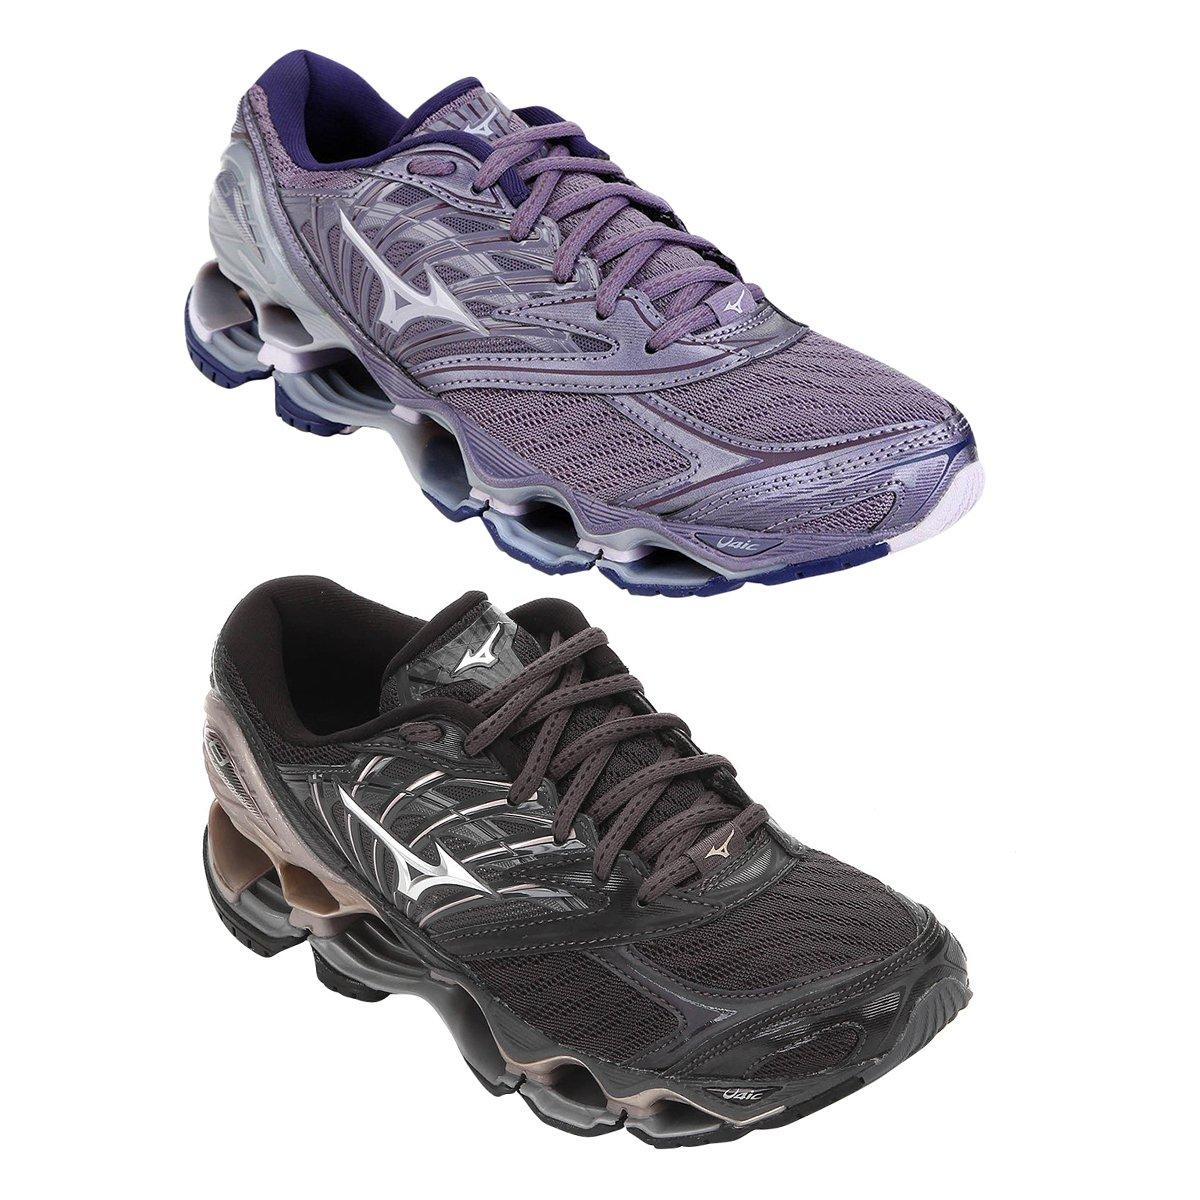 mizuno womens running shoes size 8.5 in cm herramientas